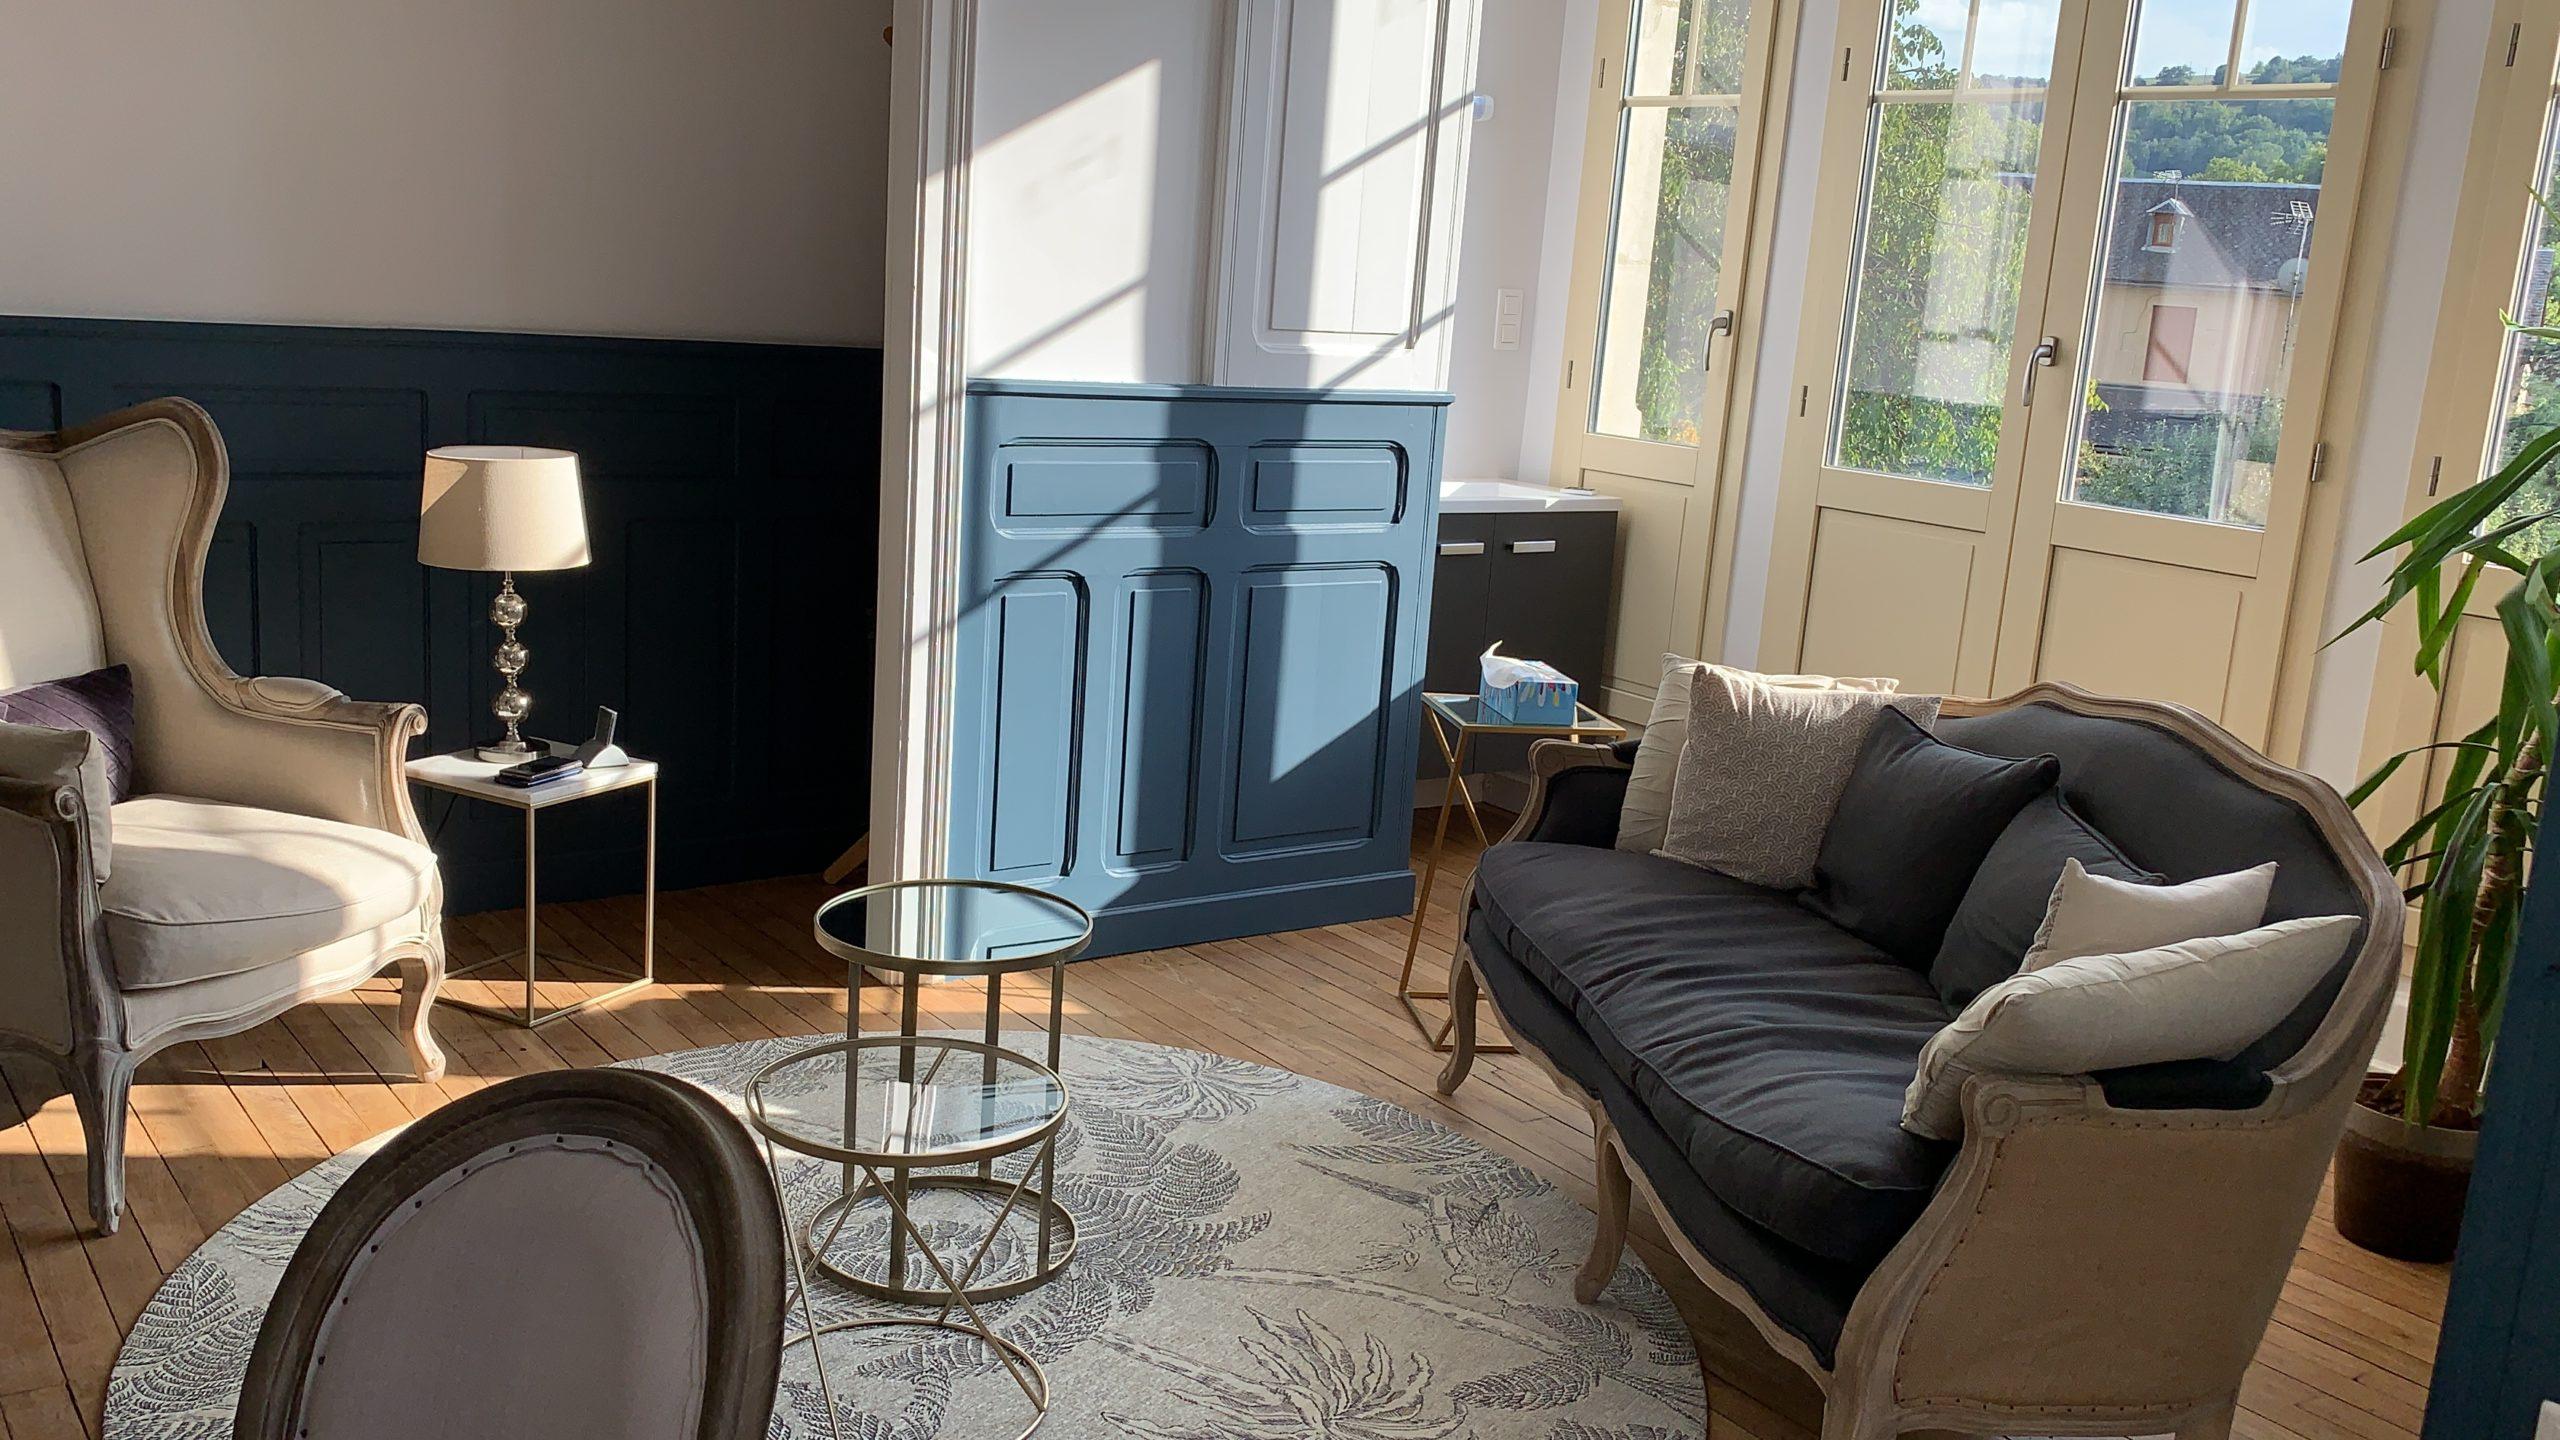 Salle consultation Psychologue Espalion Aveyron